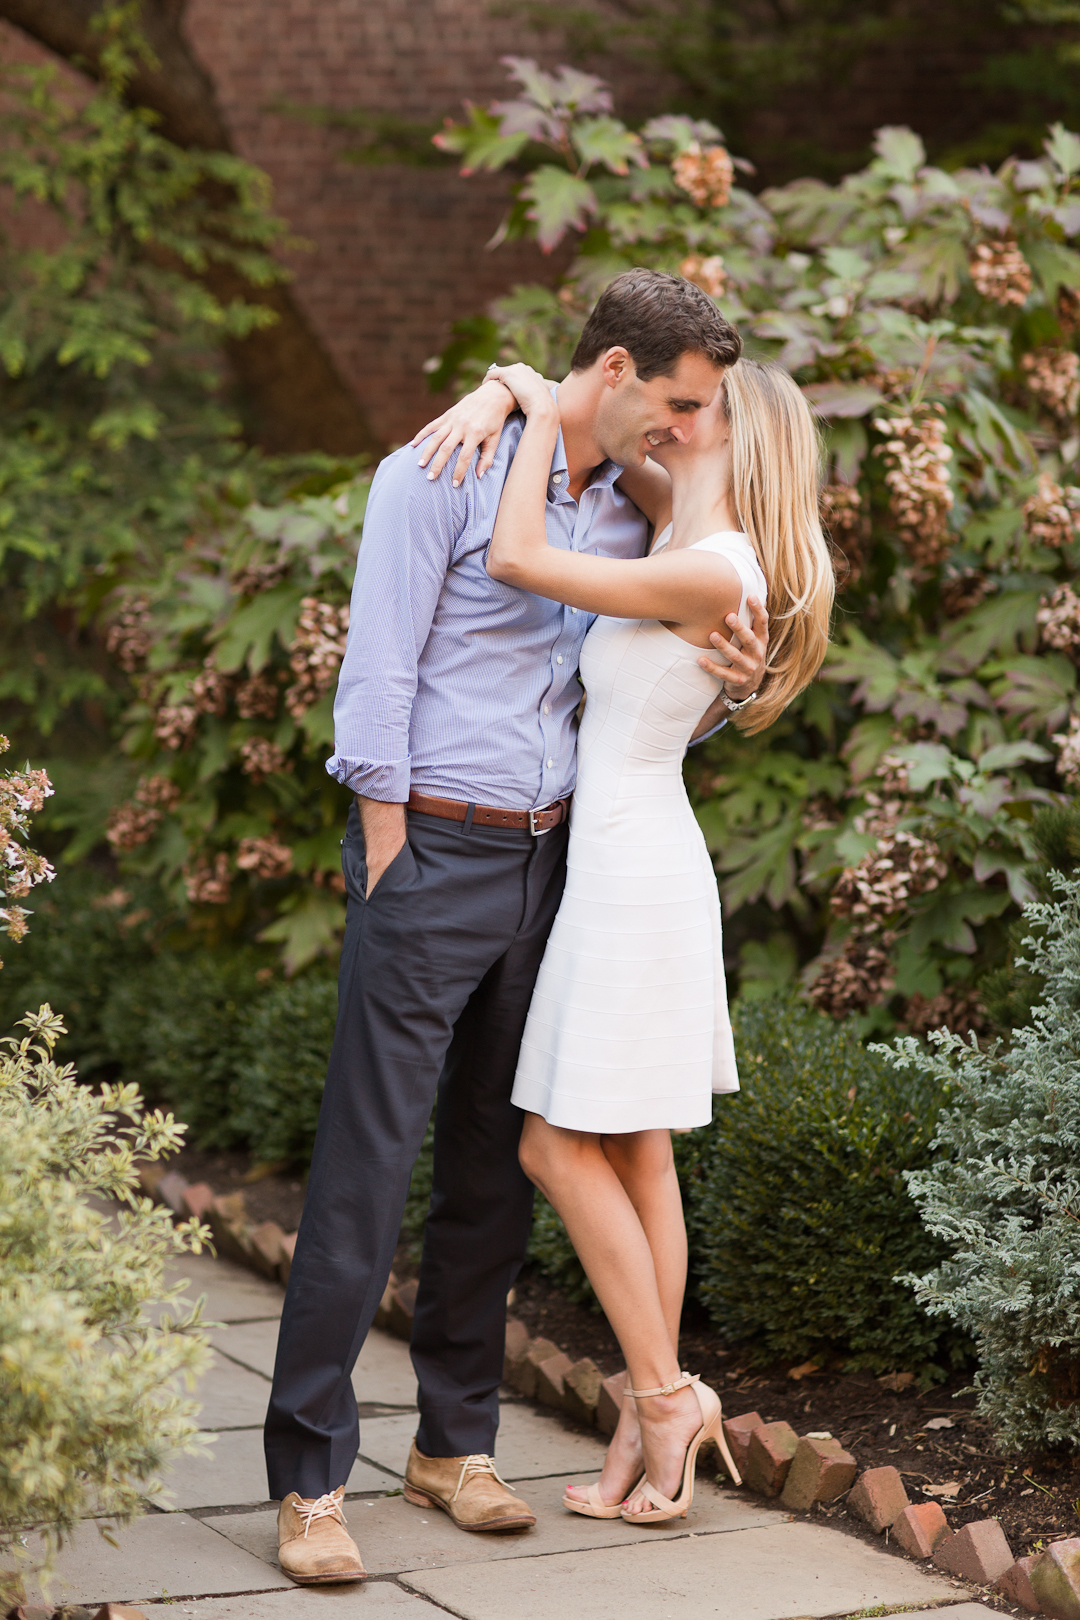 Melissa Kruse Photography - Daniece & Chris West Village Engagement Photos-102.jpg